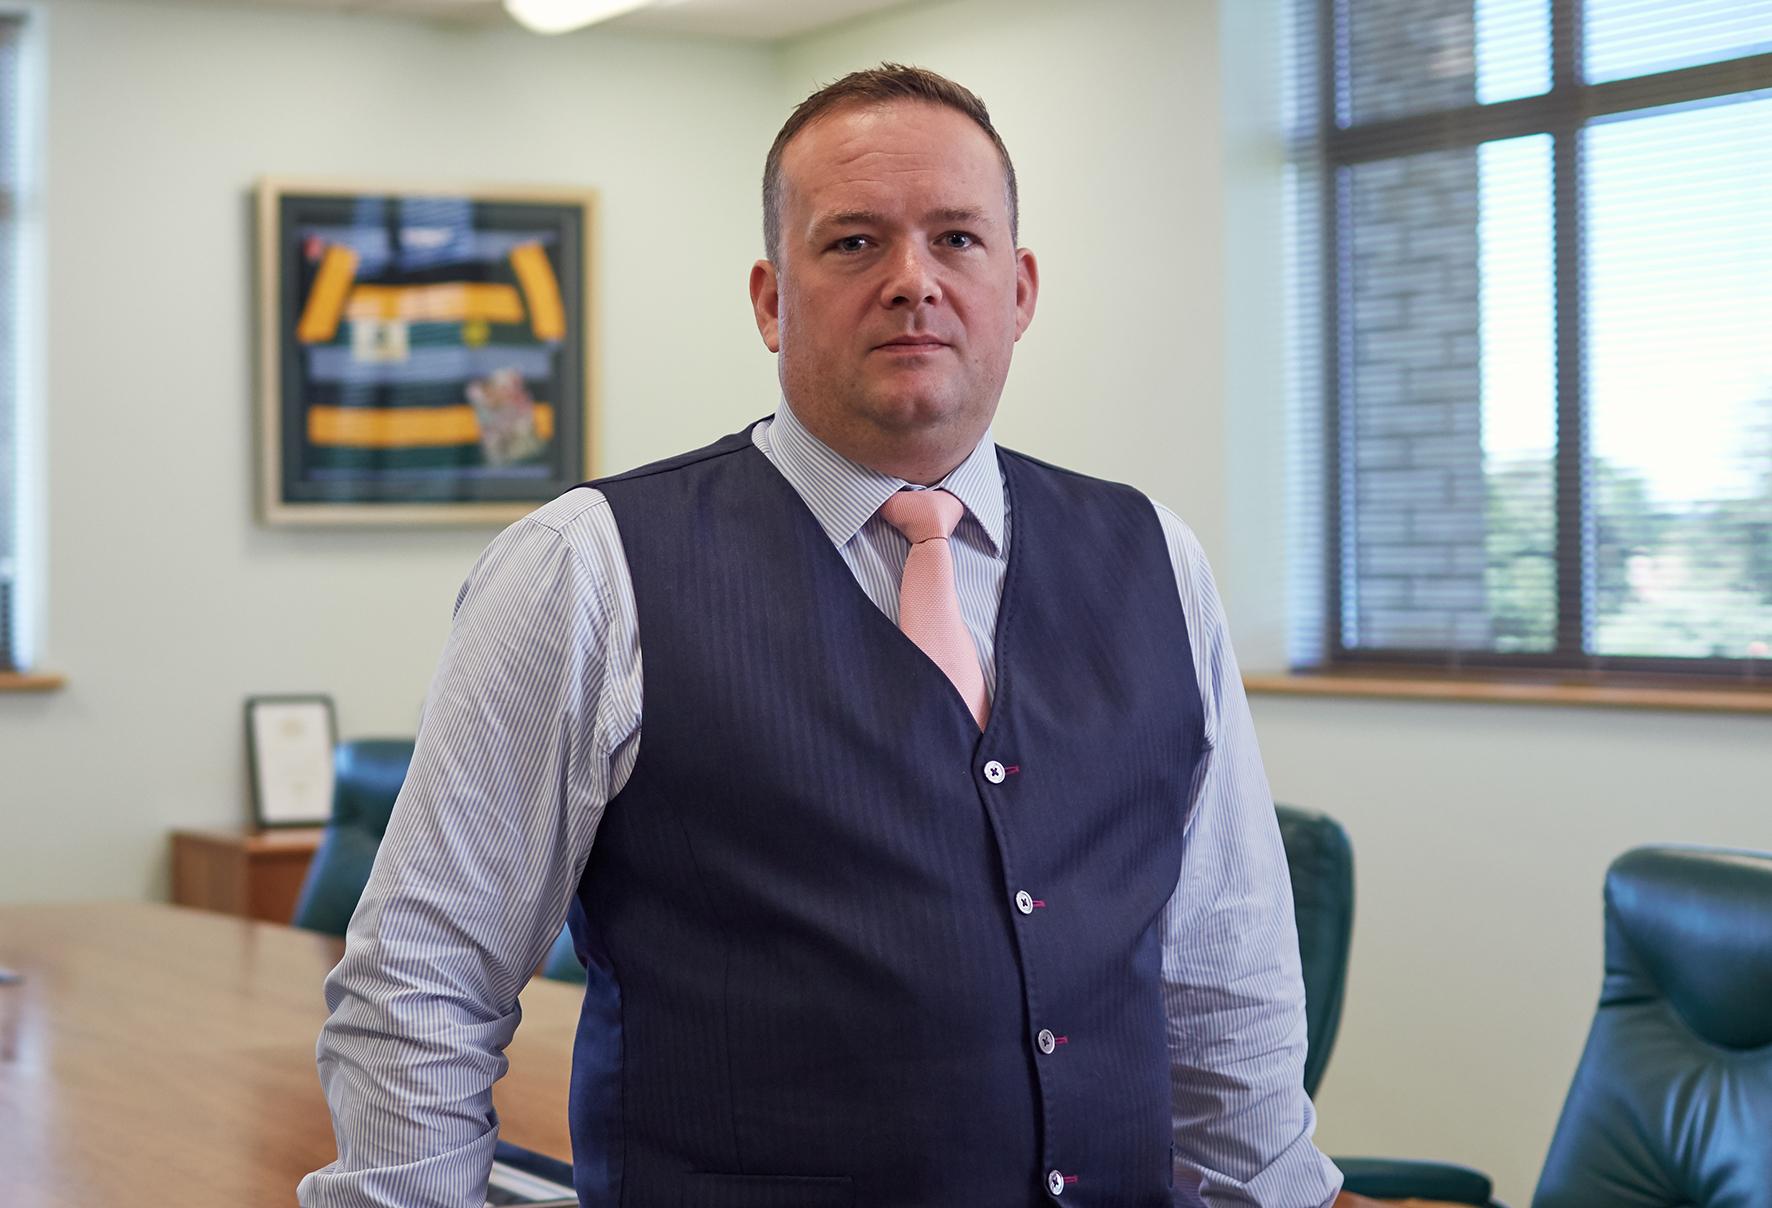 VITAL LIFELINE HELPS BRITAIN'S BUSINESSES TO 'BUILD BACK BETTER'